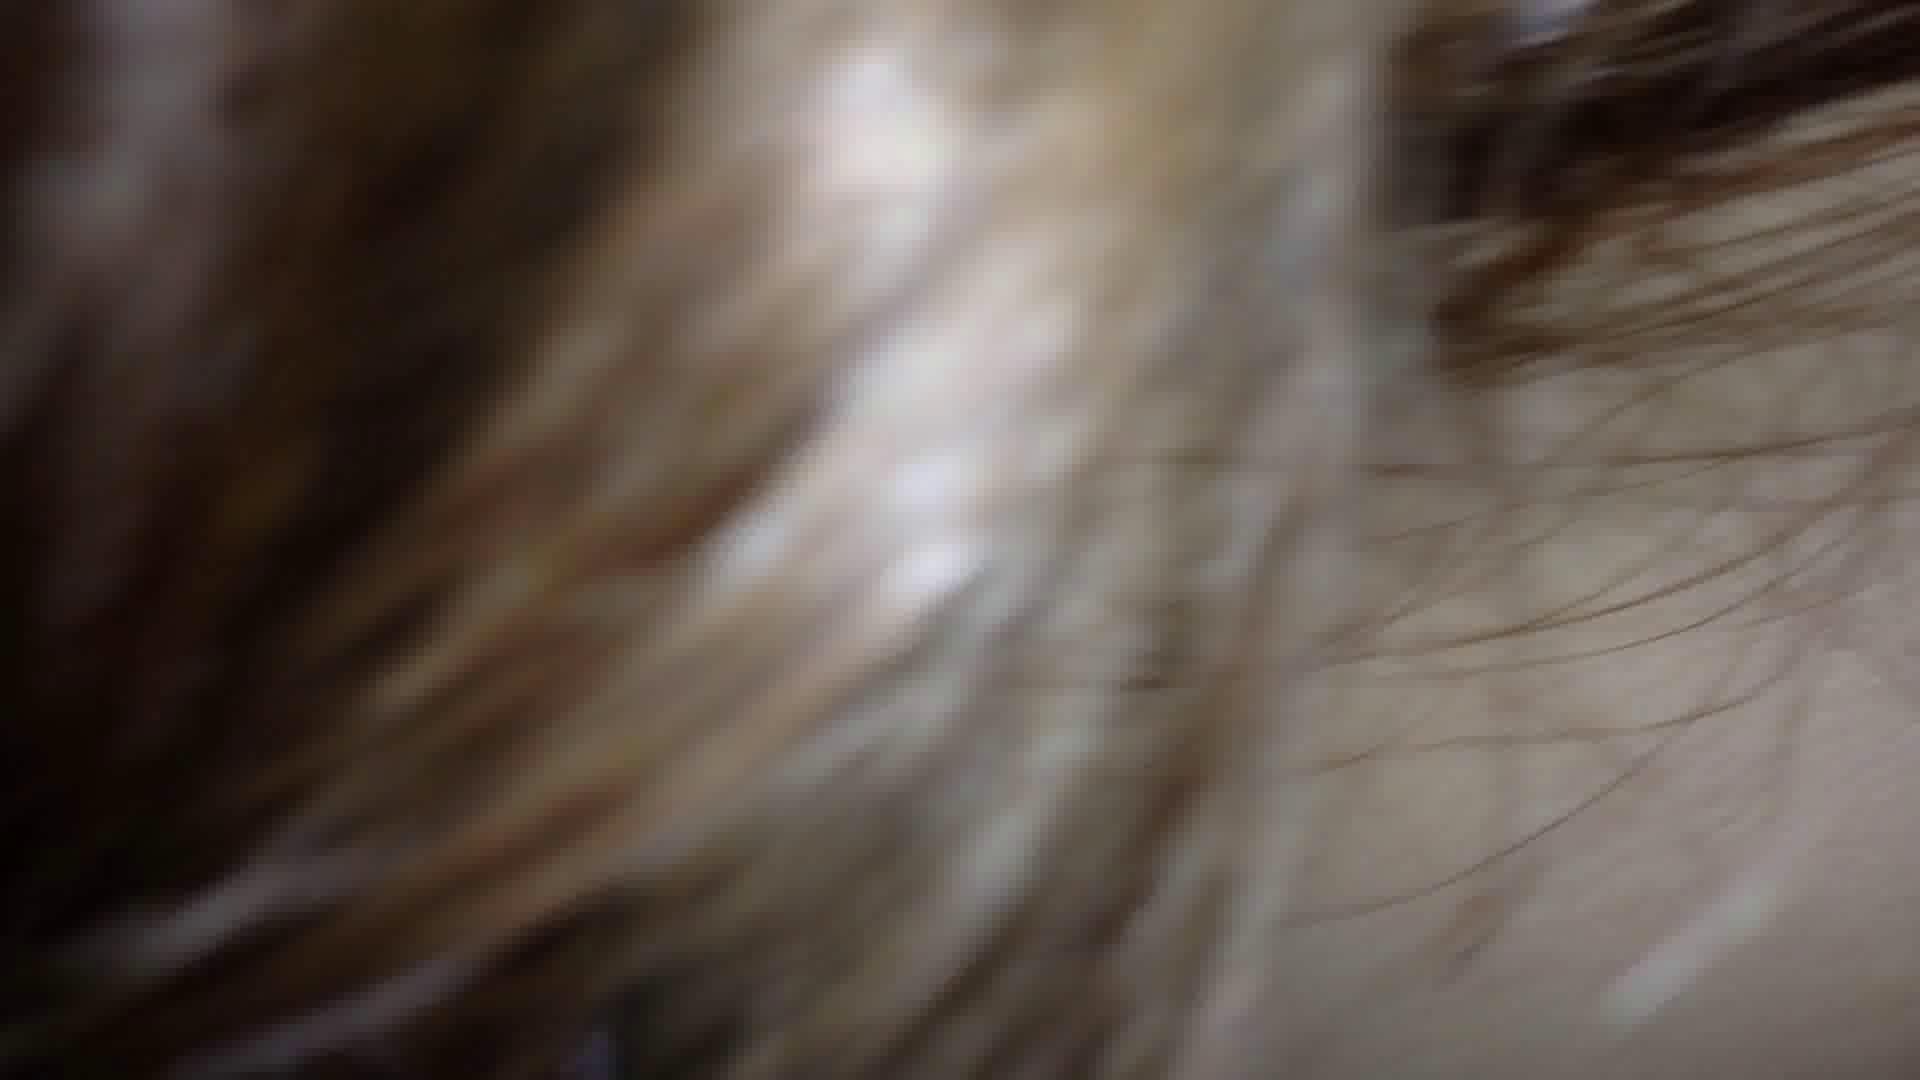 vol.45 【YMちゃん】現役JD純白パンツのお嬢様 いじくり スケベ動画紹介 49画像 45